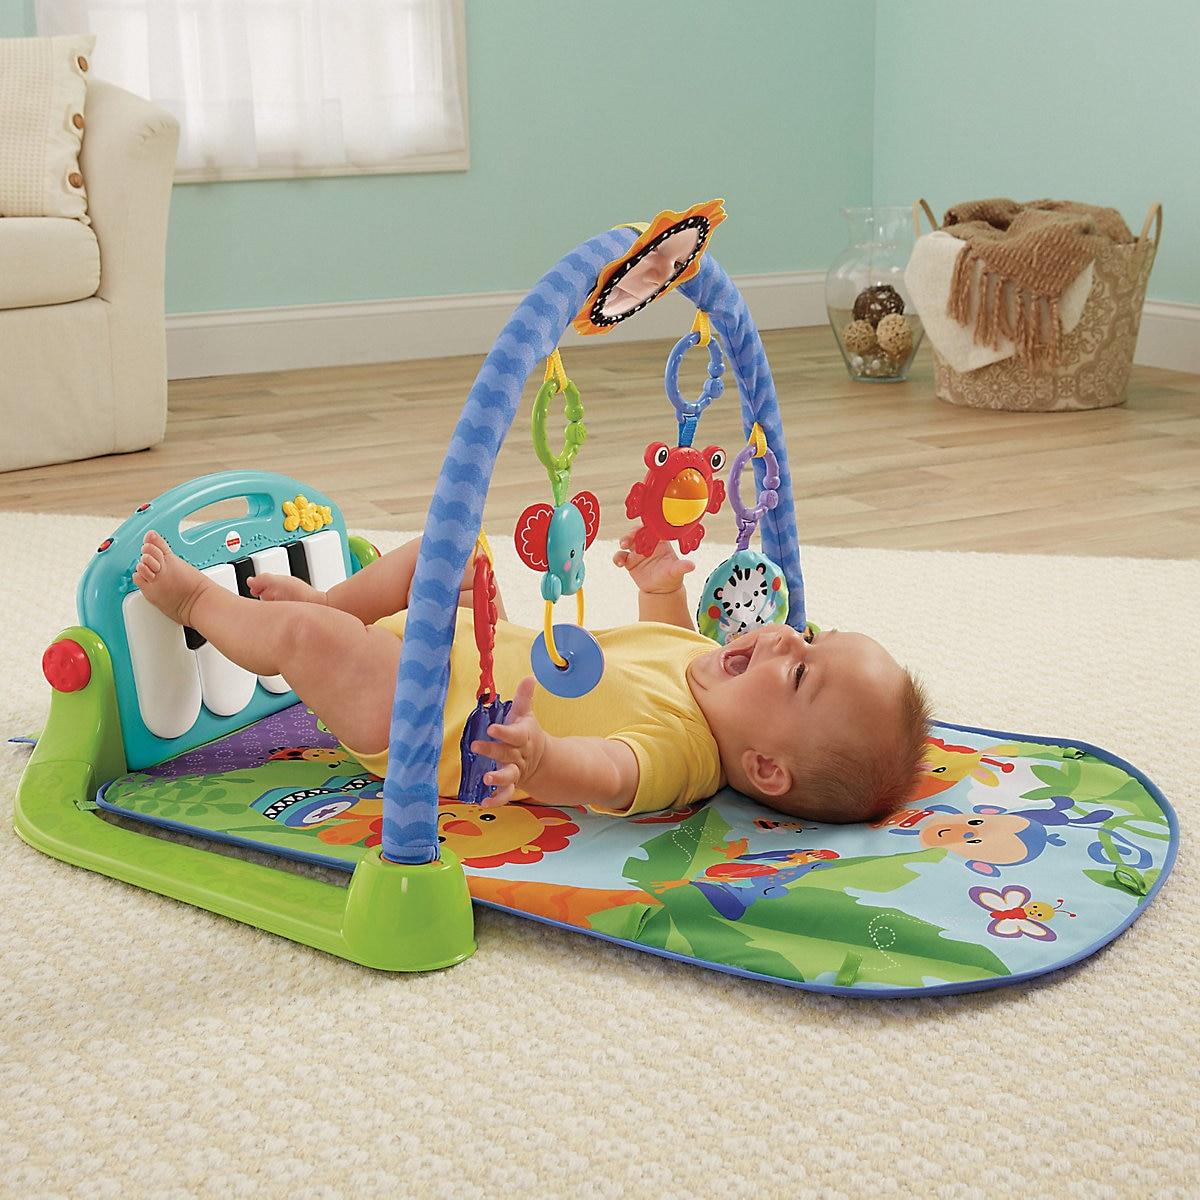 Play Mats FISHER-PRICE 3399157 Play Carpet Mat Developmental Children Educational Busy Toys For Boys Girls Baby Mat MTpromo